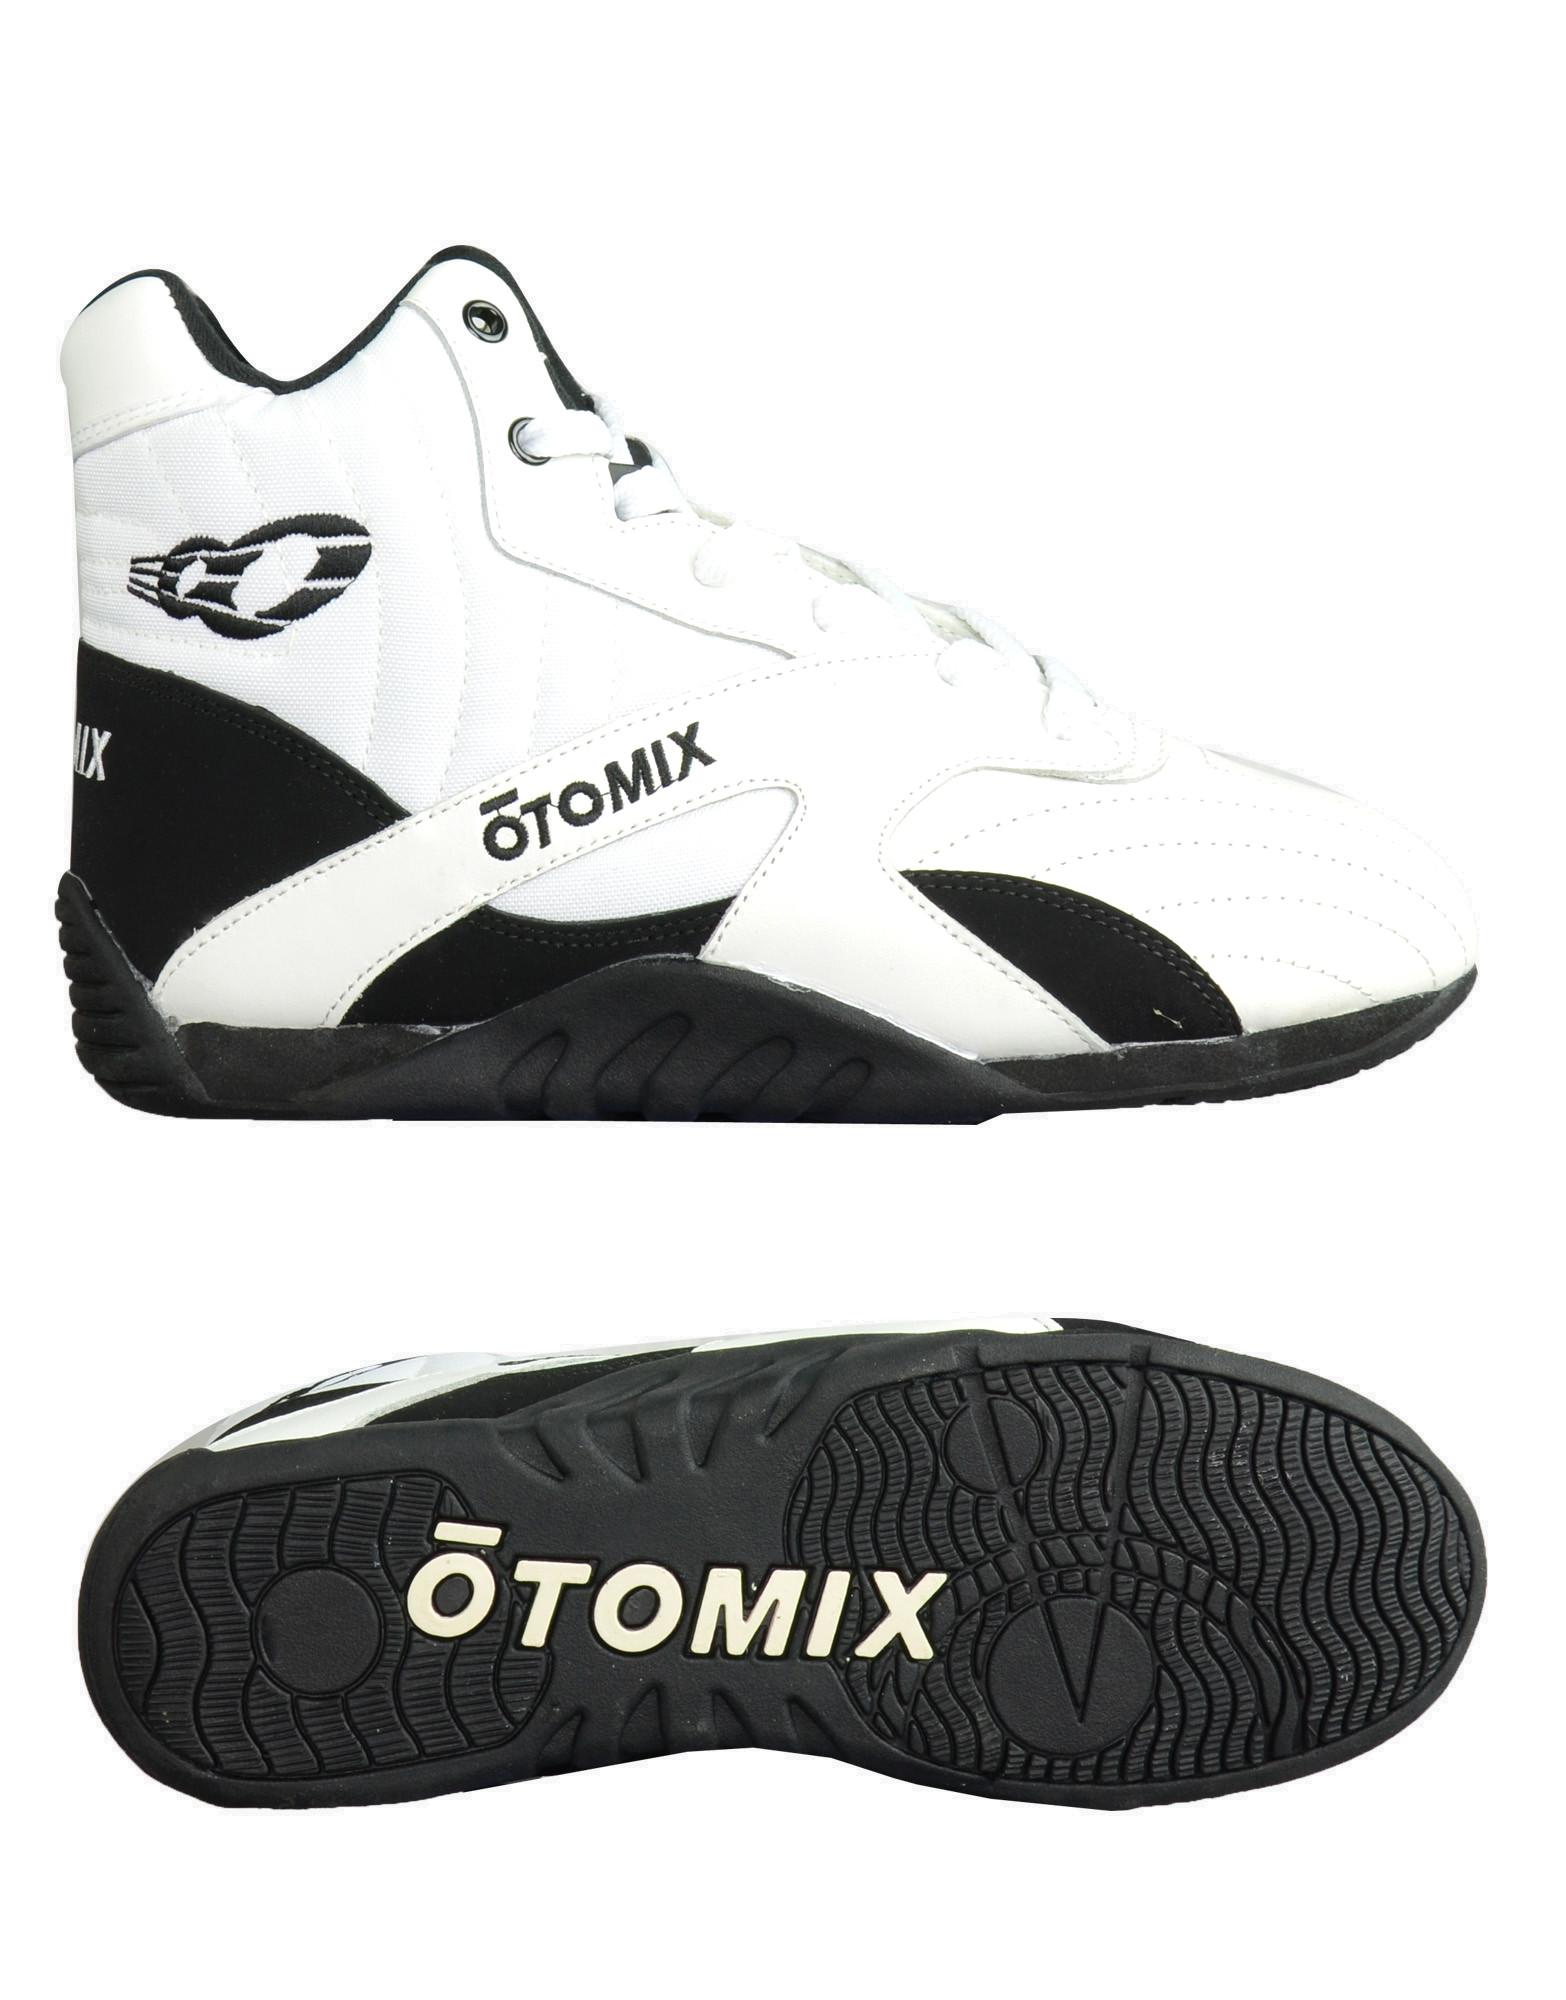 0fec9b82c62b The Power Trainer by OTOMIX (colour  white   black)